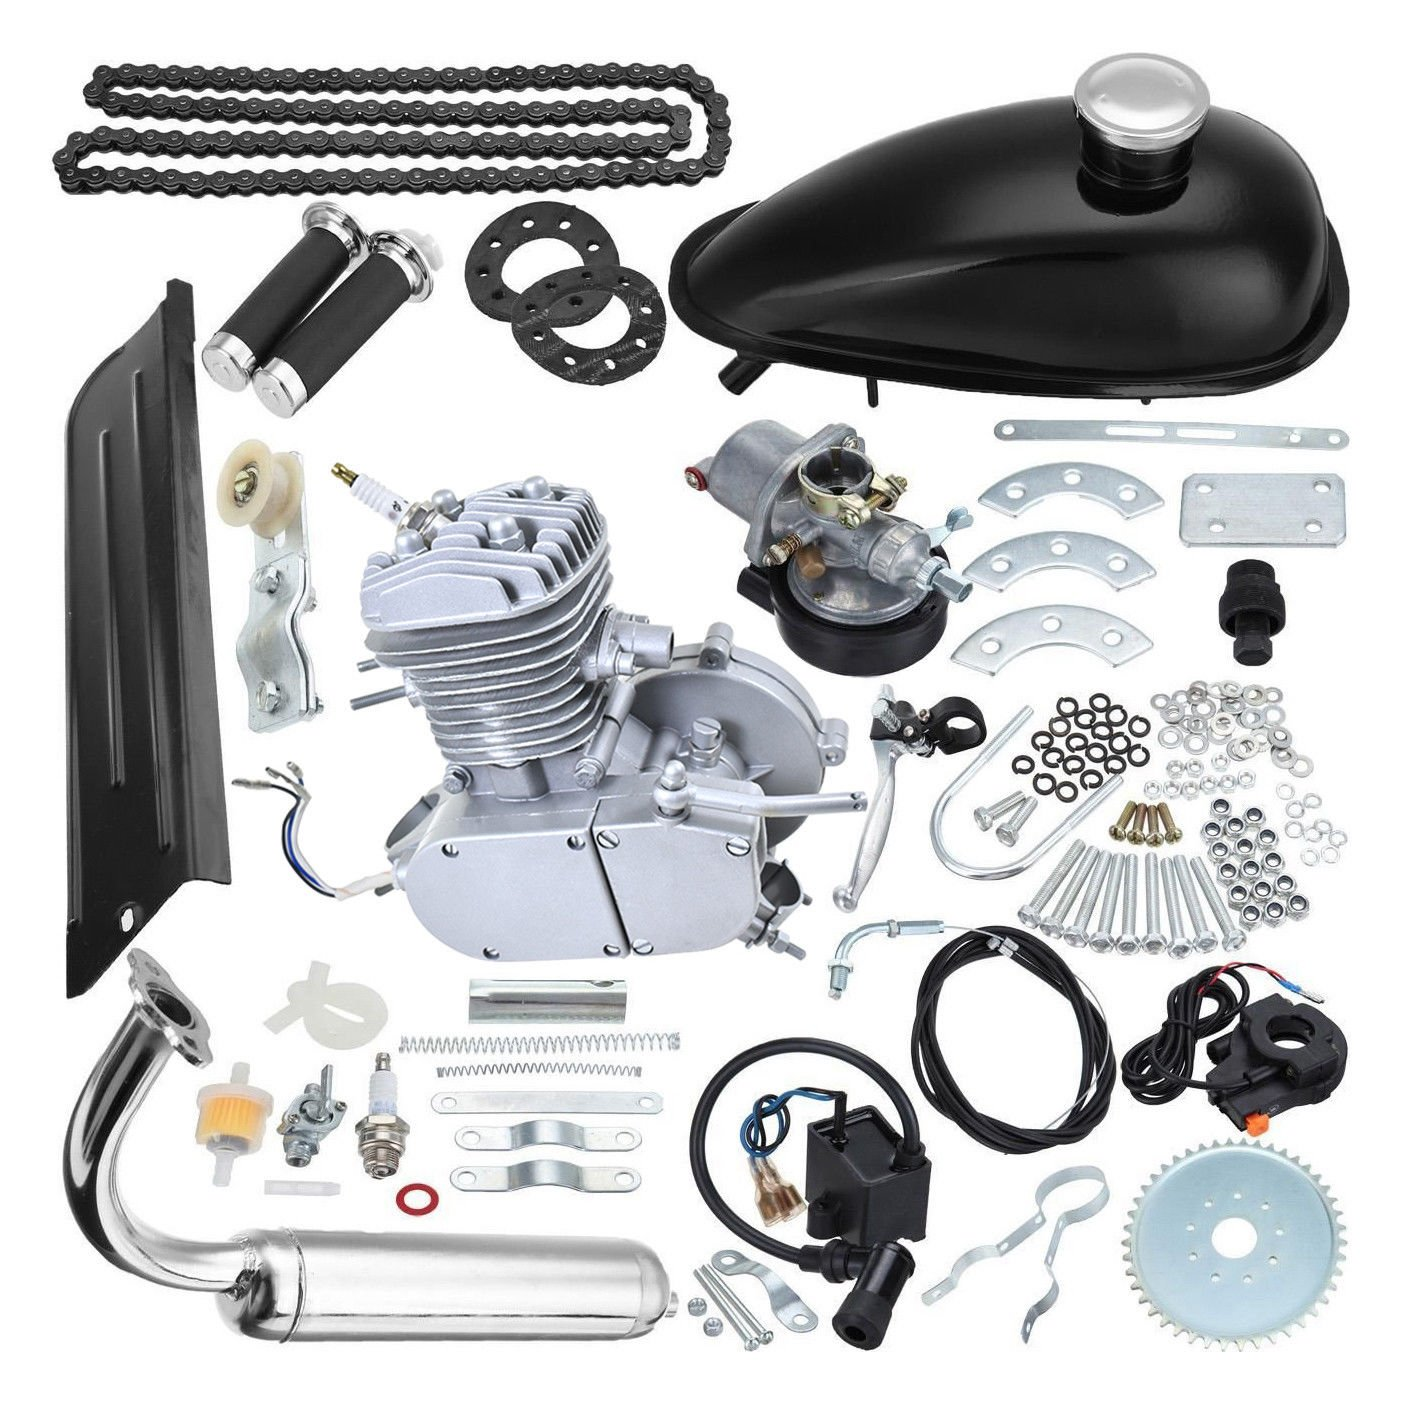 Thegood88 80cc Bike Bicycle Motorized 2 Stroke Petrol Gas Motor Engine Kit Set Silver TG0164